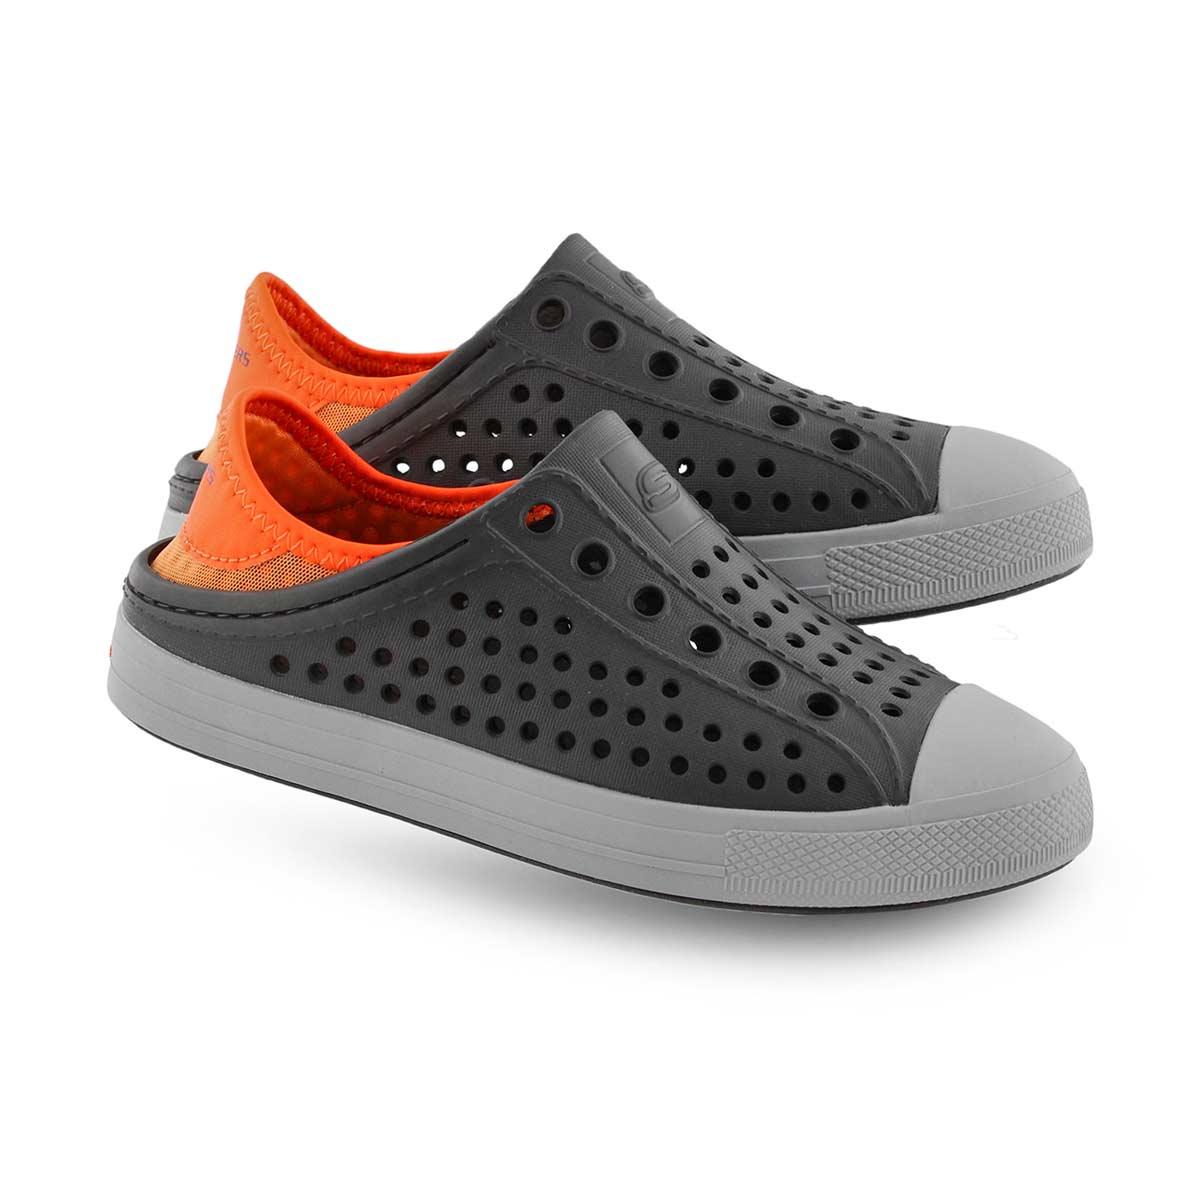 Bys GuzmanStepsAquaSurge gry/org shoes